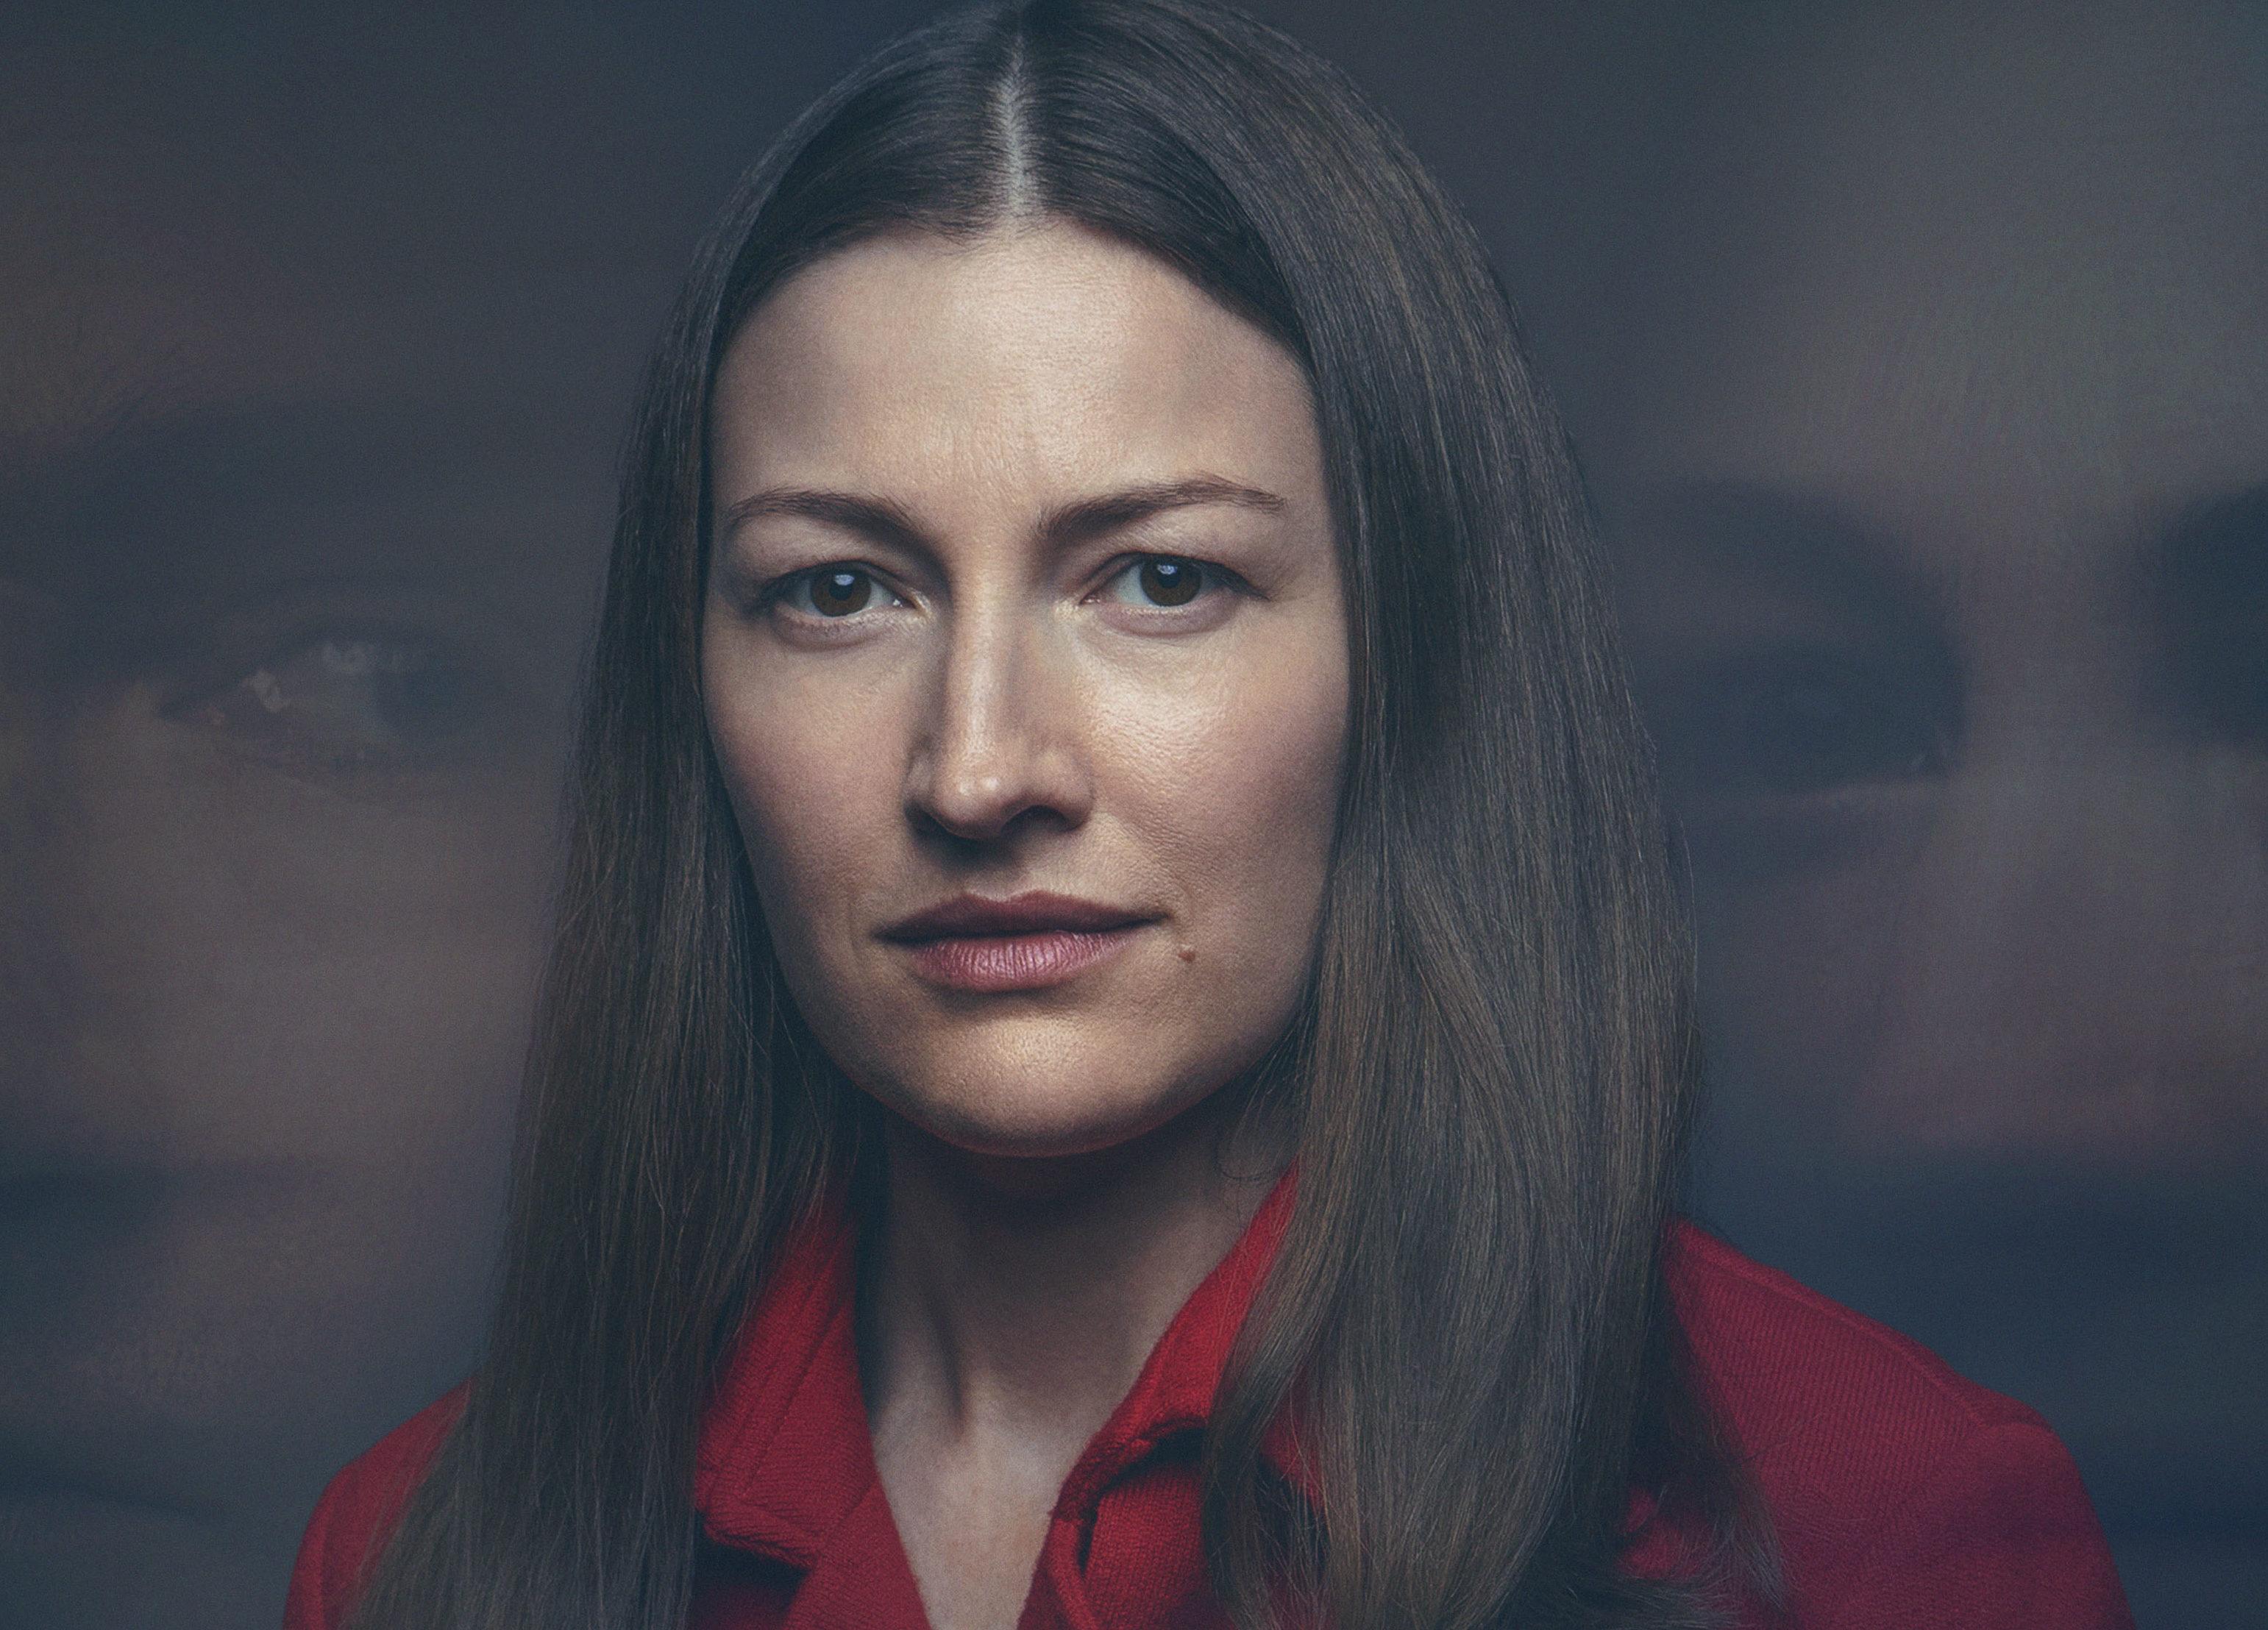 Kelly MacDonald in The Victim.